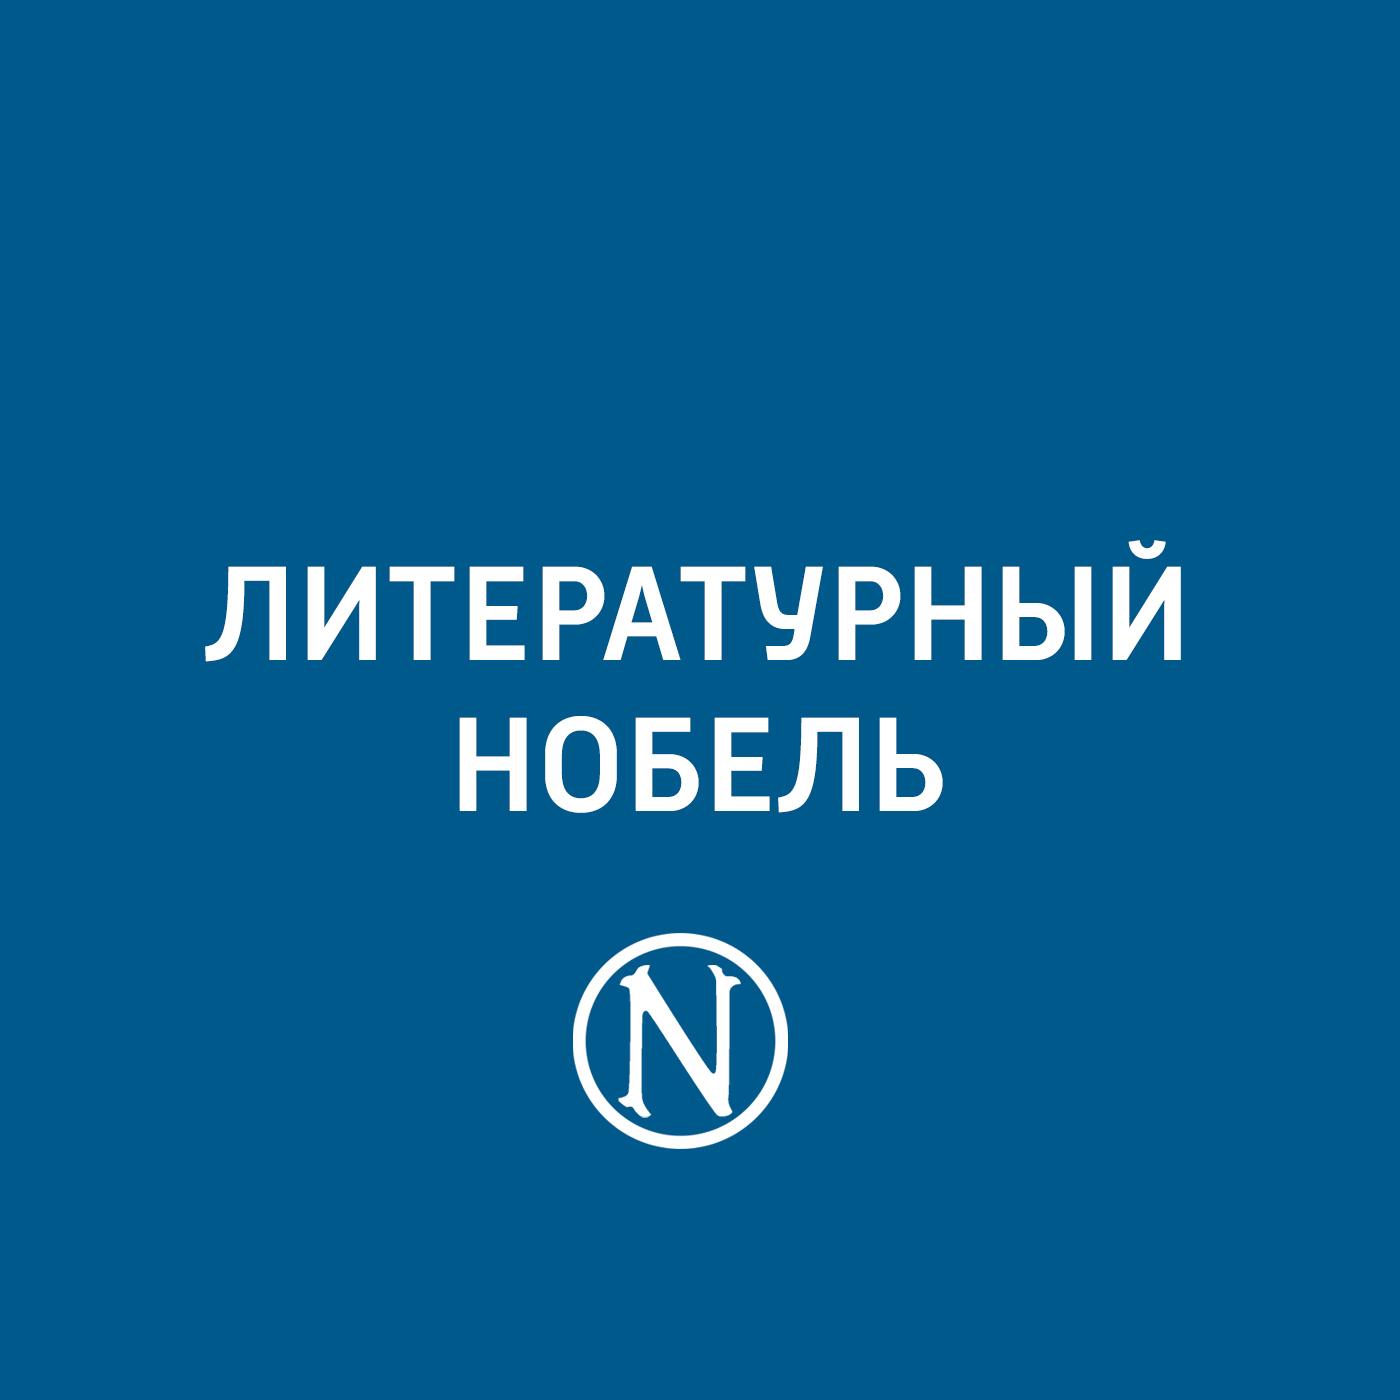 Евгений Стаховский Генрик Сенкевич евгений стаховский генрик сенкевич